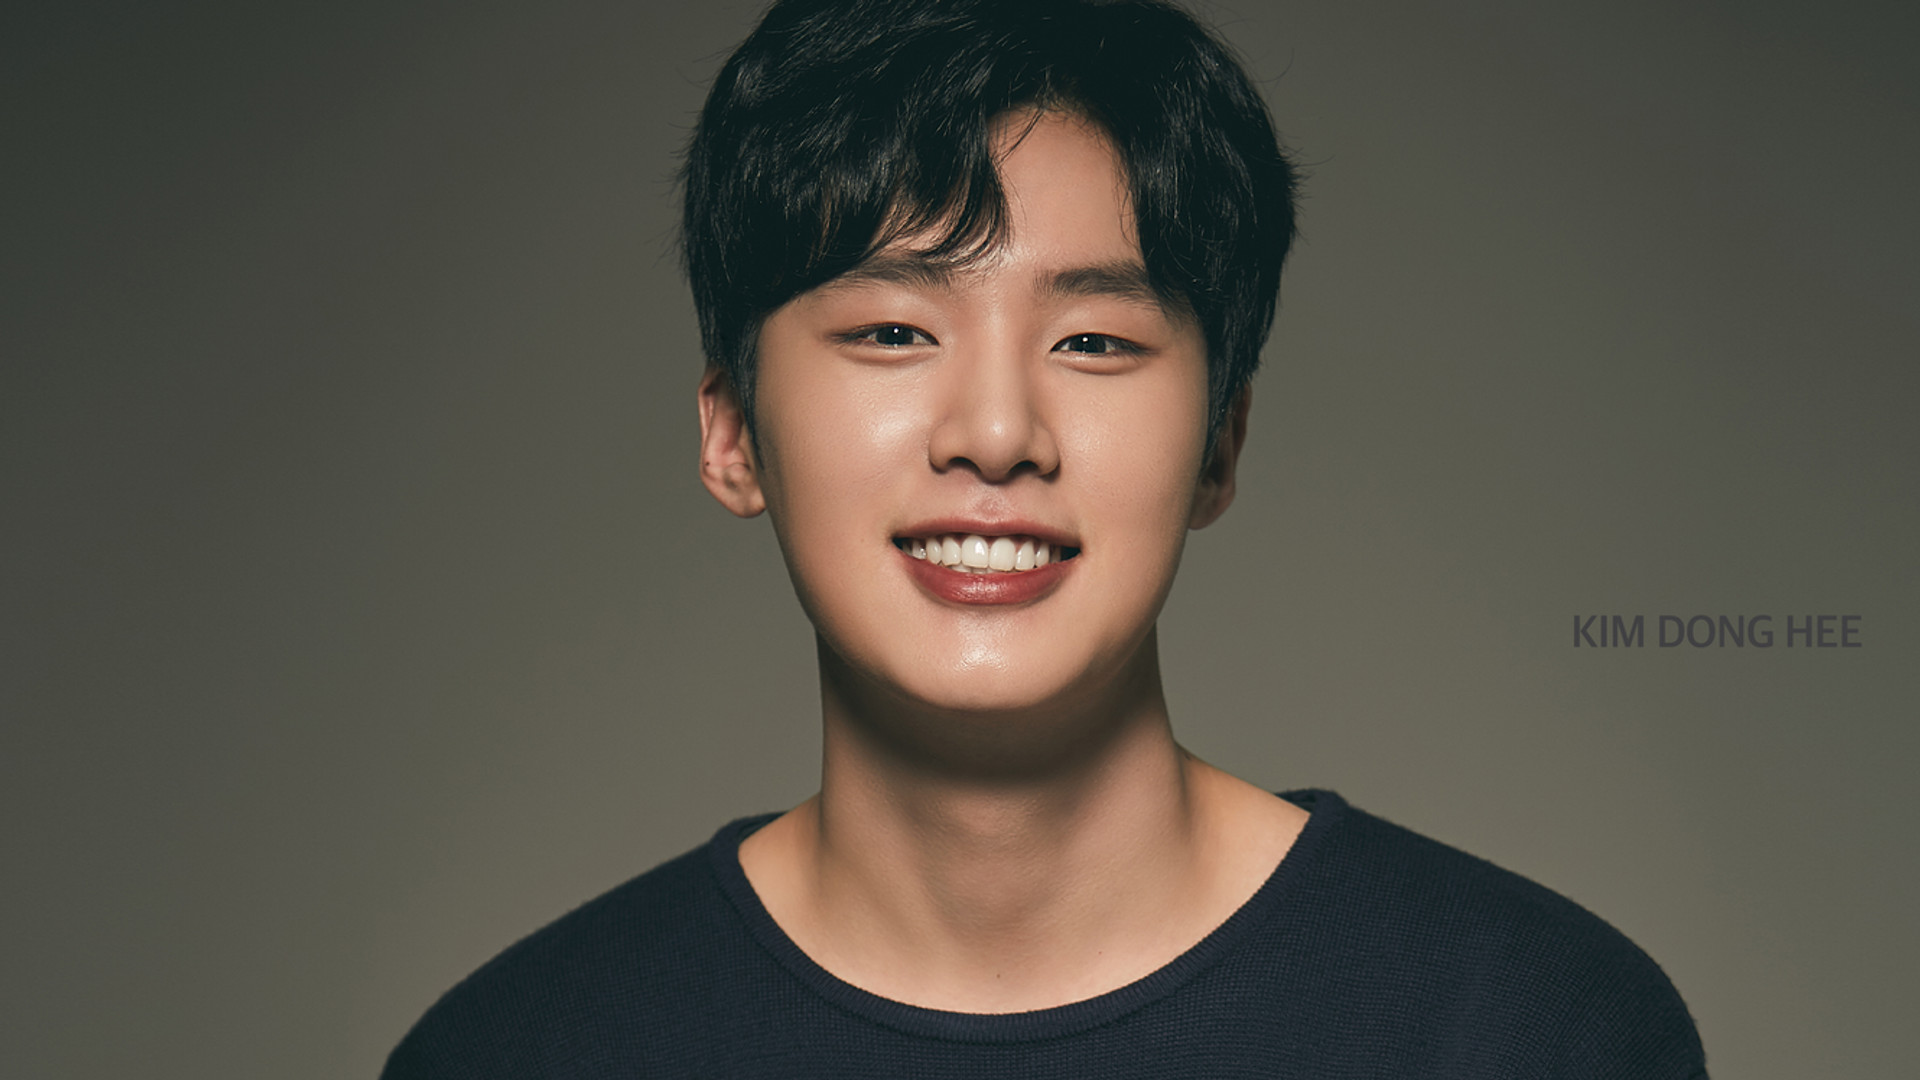 Kim Dong Hee 김동희